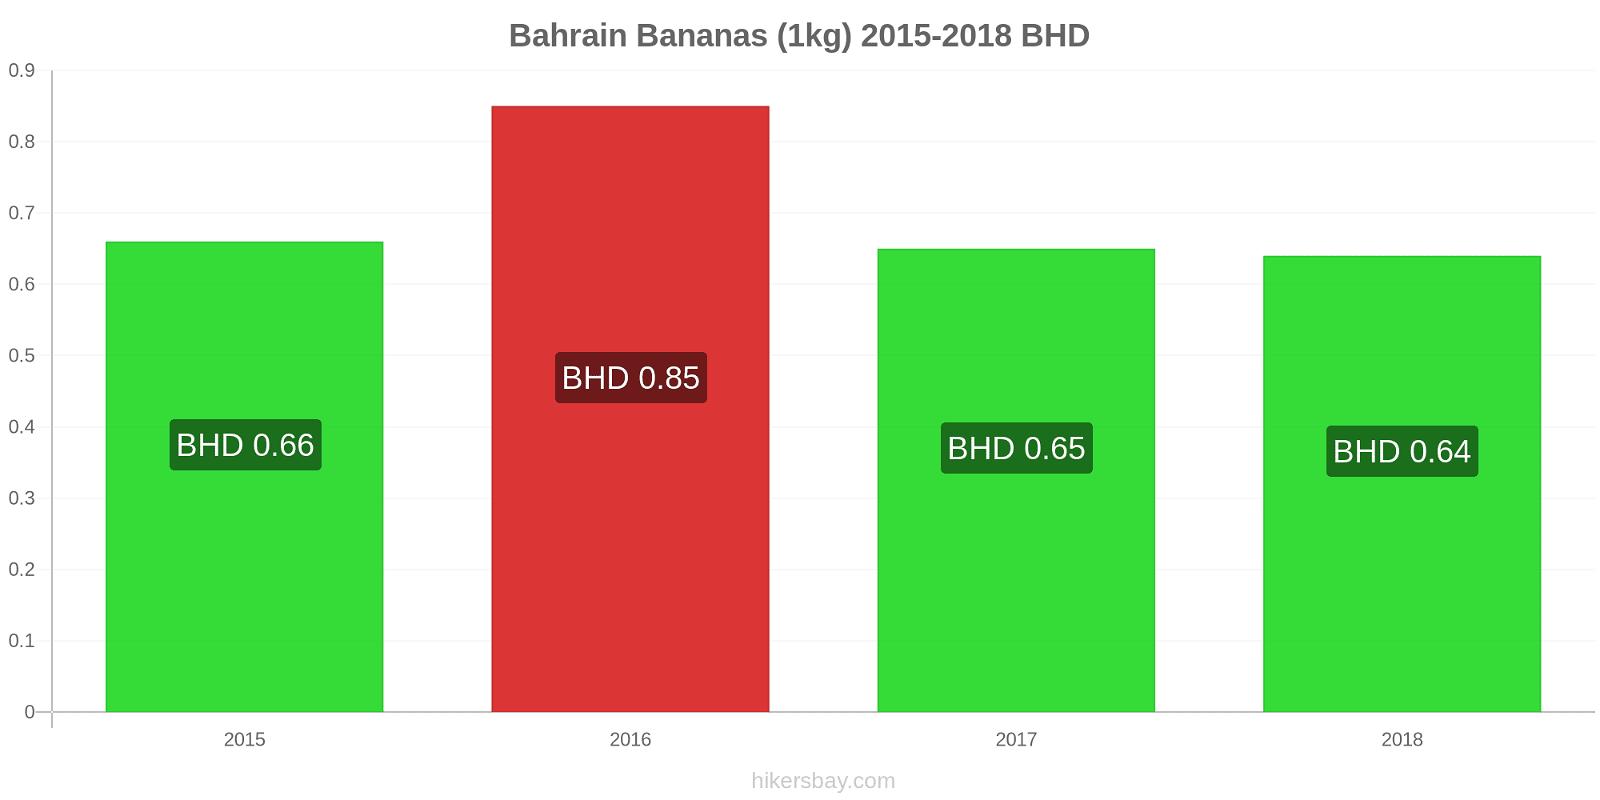 Bahrain price changes Bananas (1kg) hikersbay.com